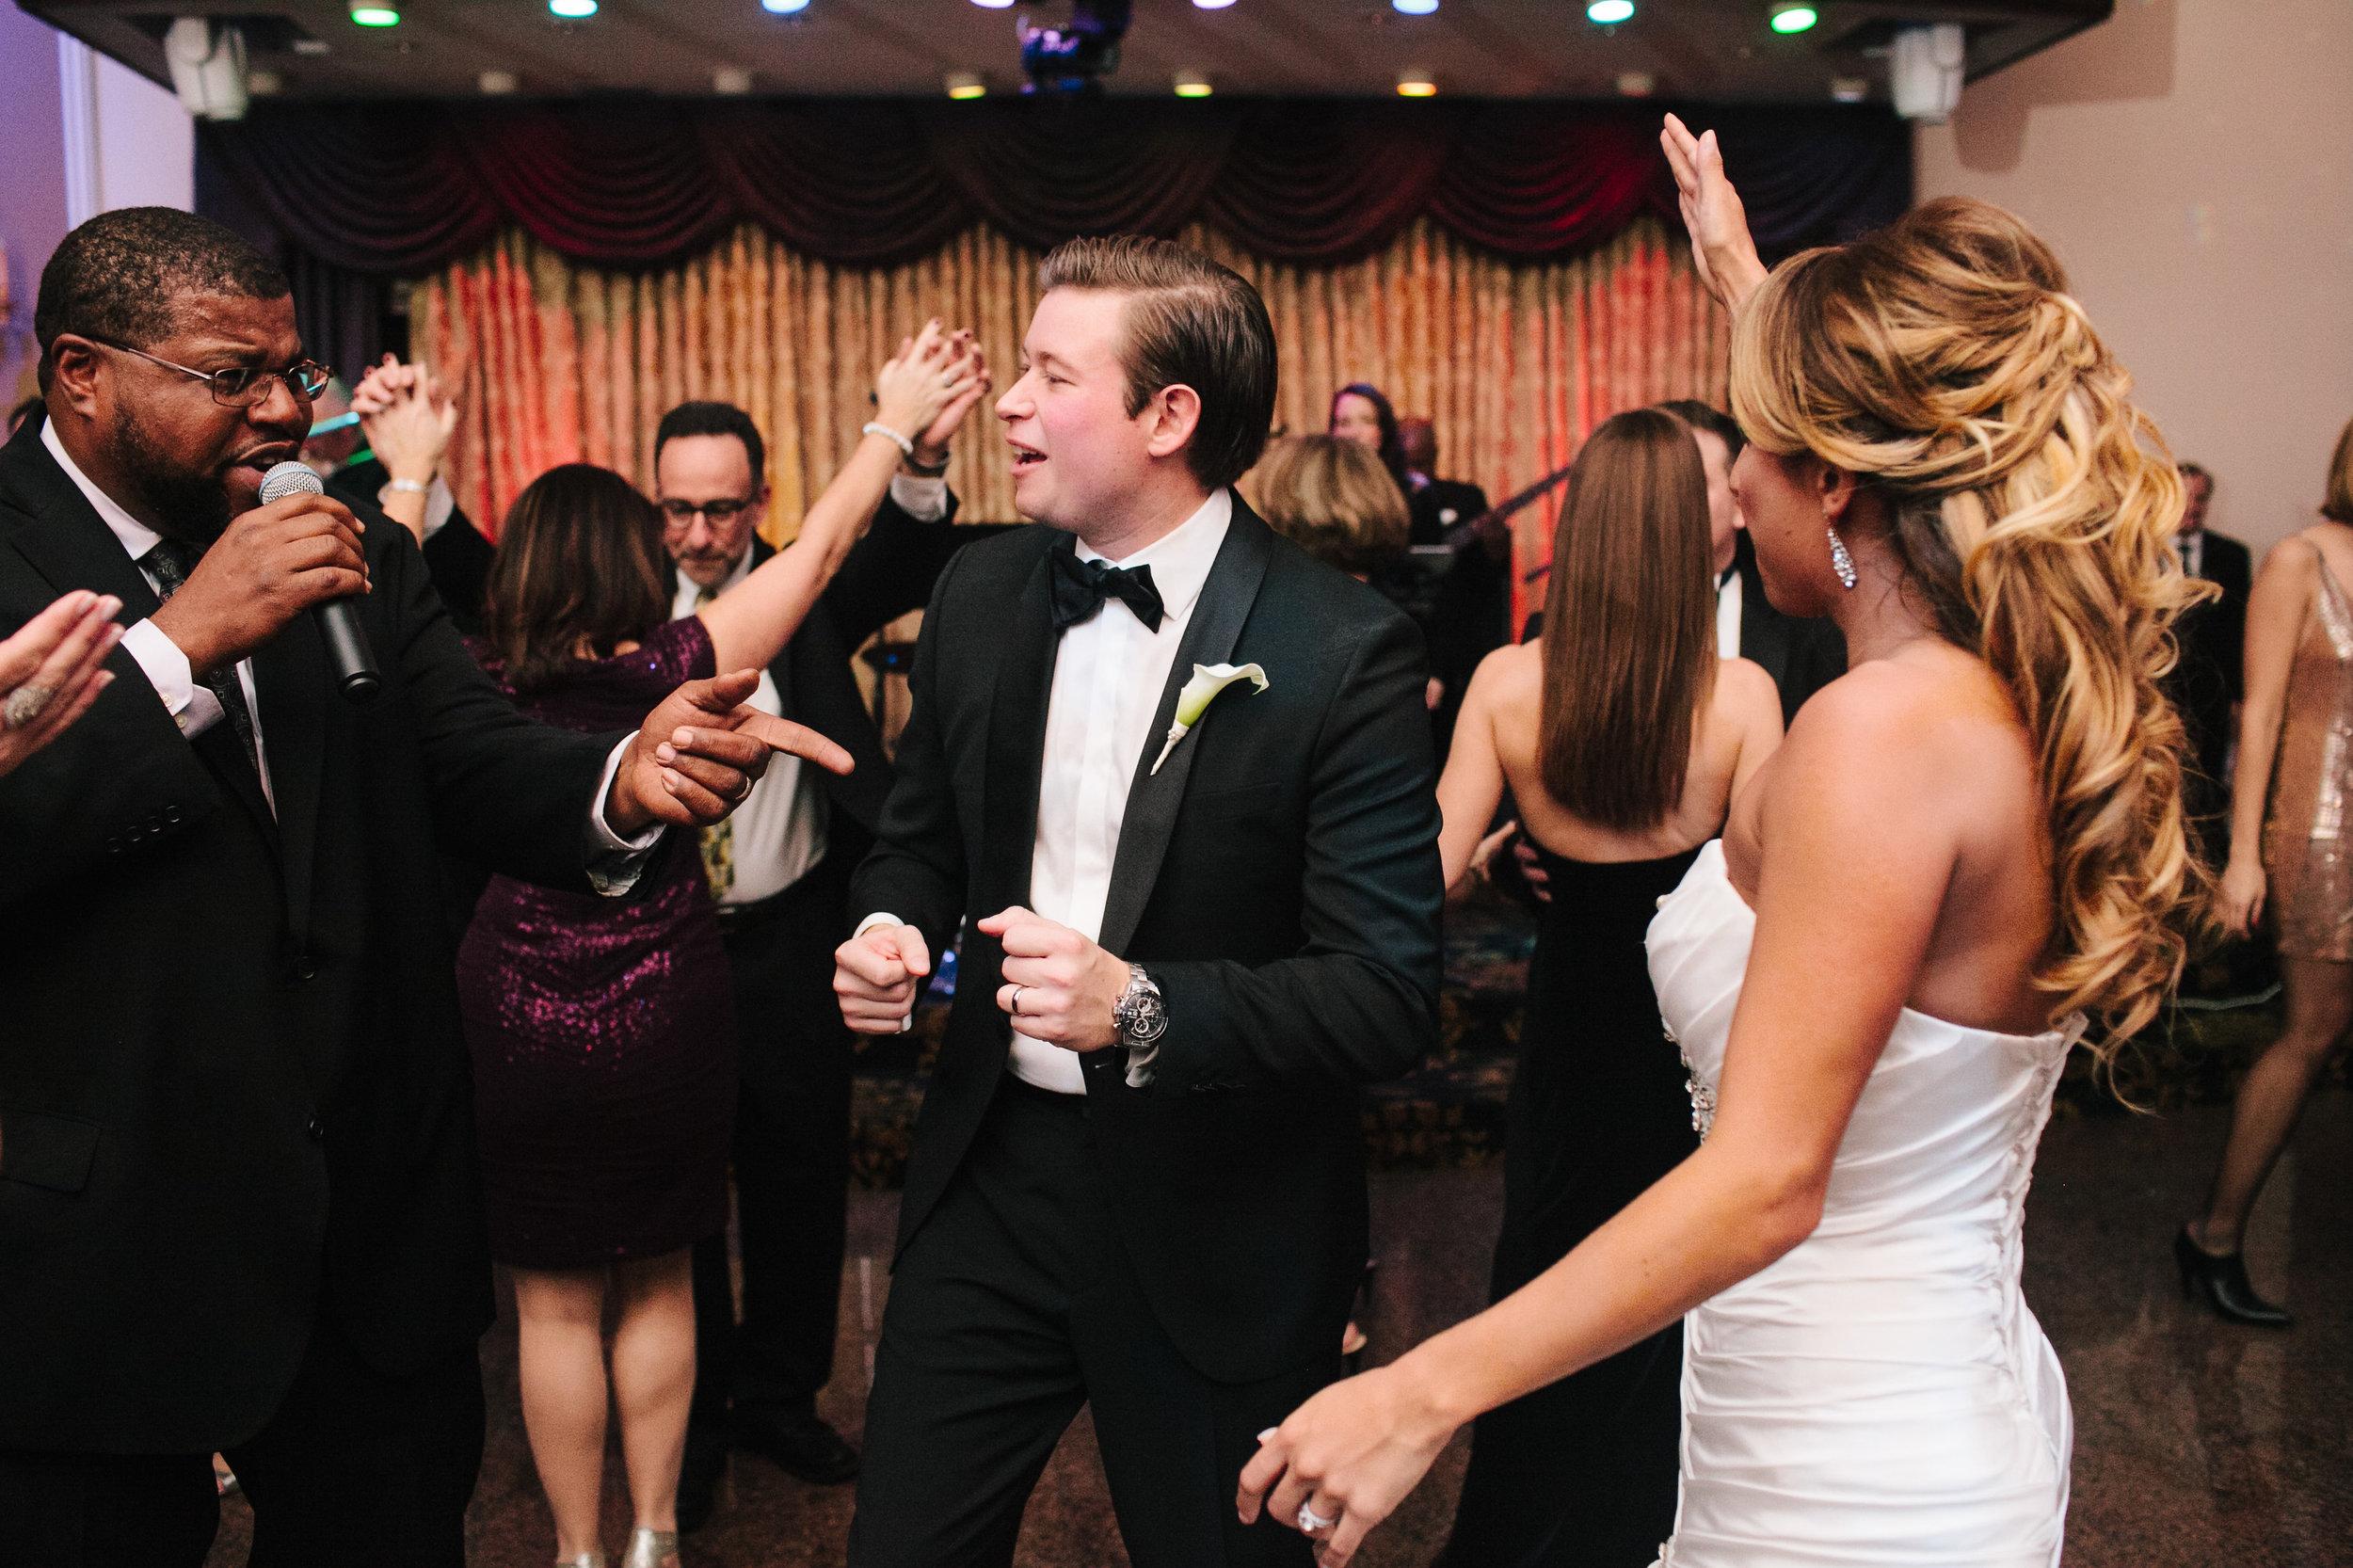 Ceci_New_York_Custom_Invitation_ New_Jersey_Wedding_Luxury_Personalized_Ceci_Style_Bride_Foil_Stamping163.JPG